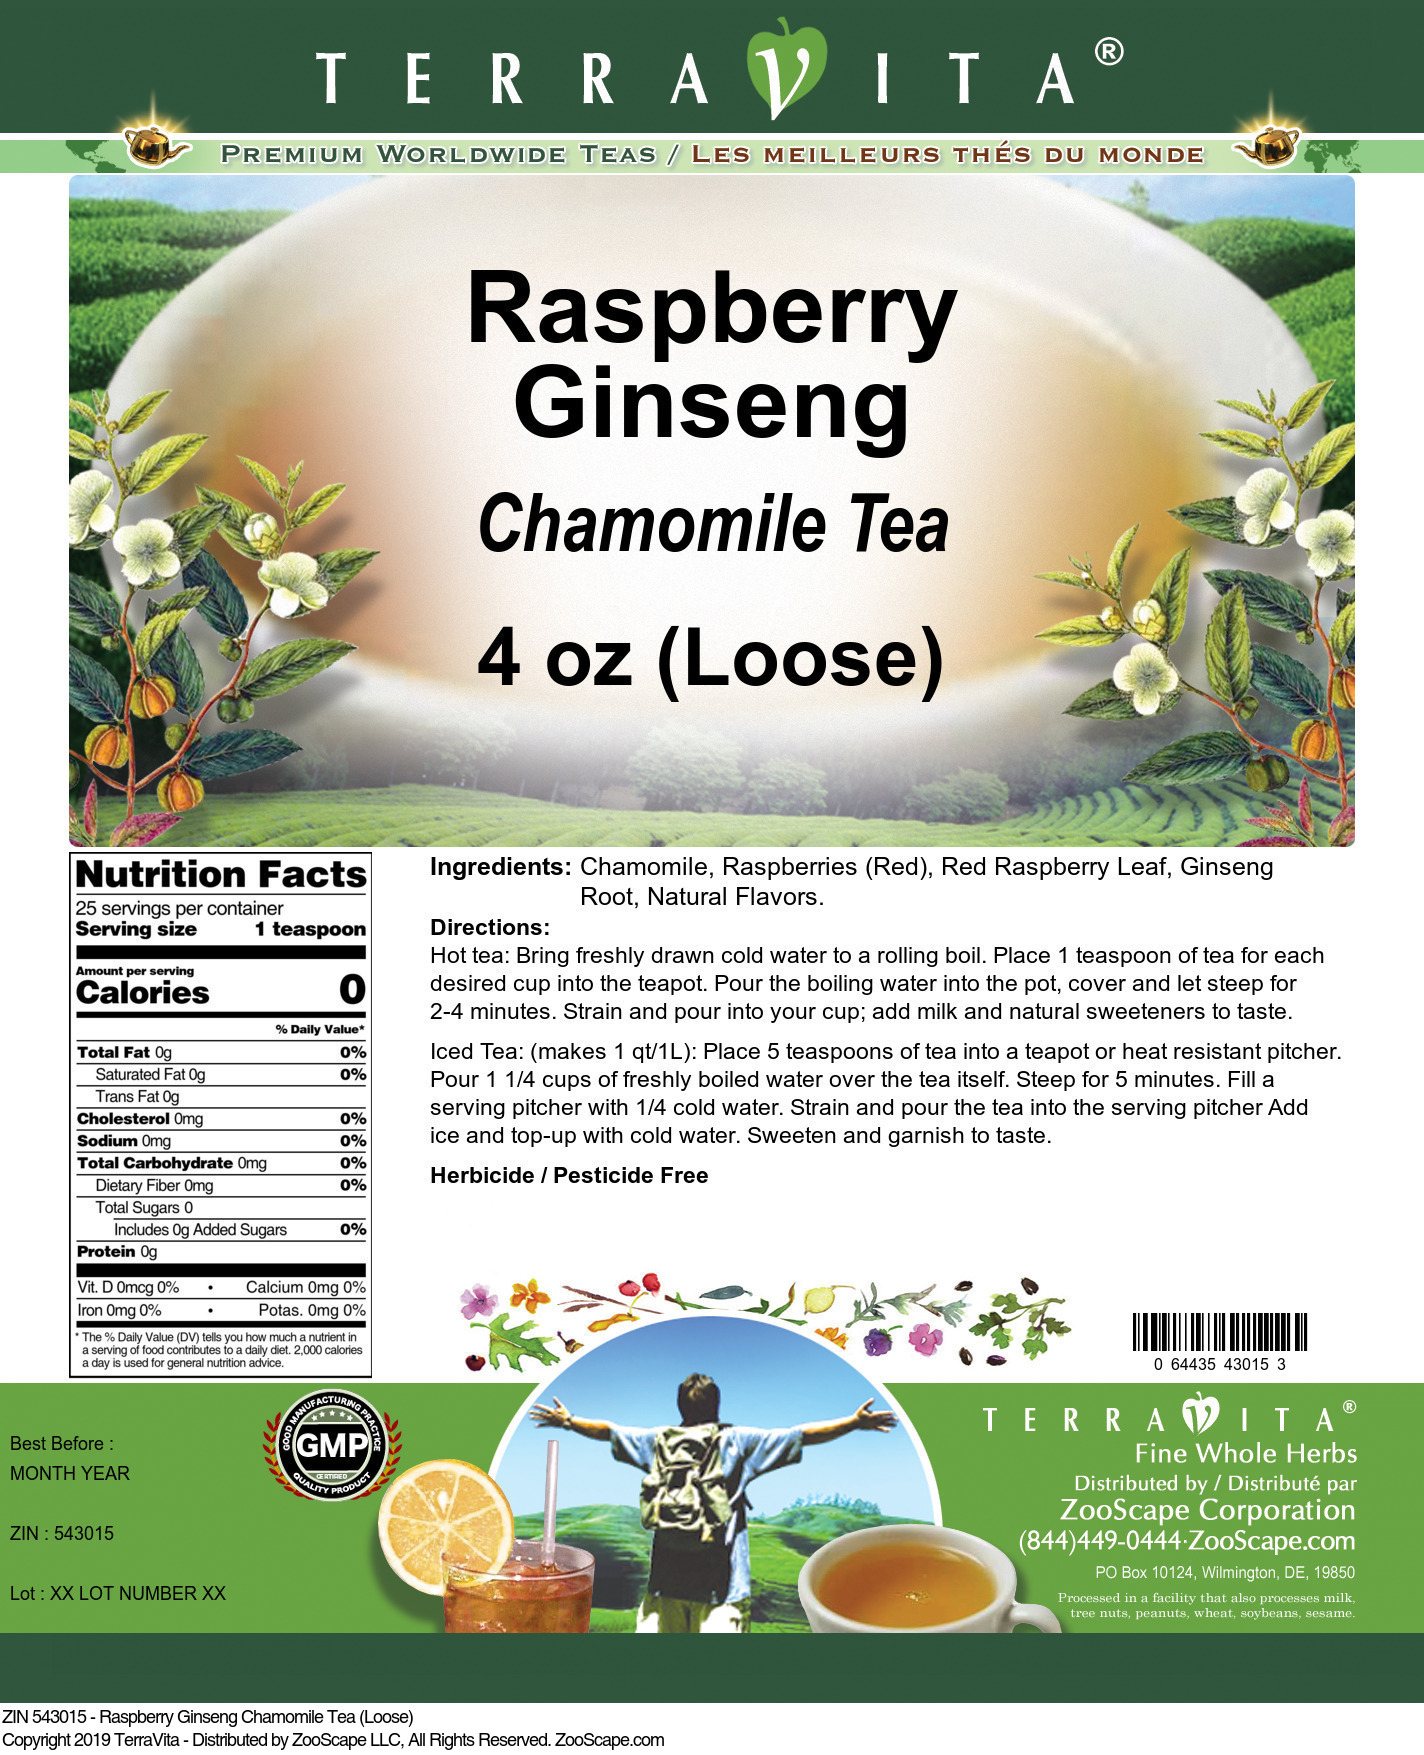 Raspberry Ginseng Chamomile Tea (Loose)